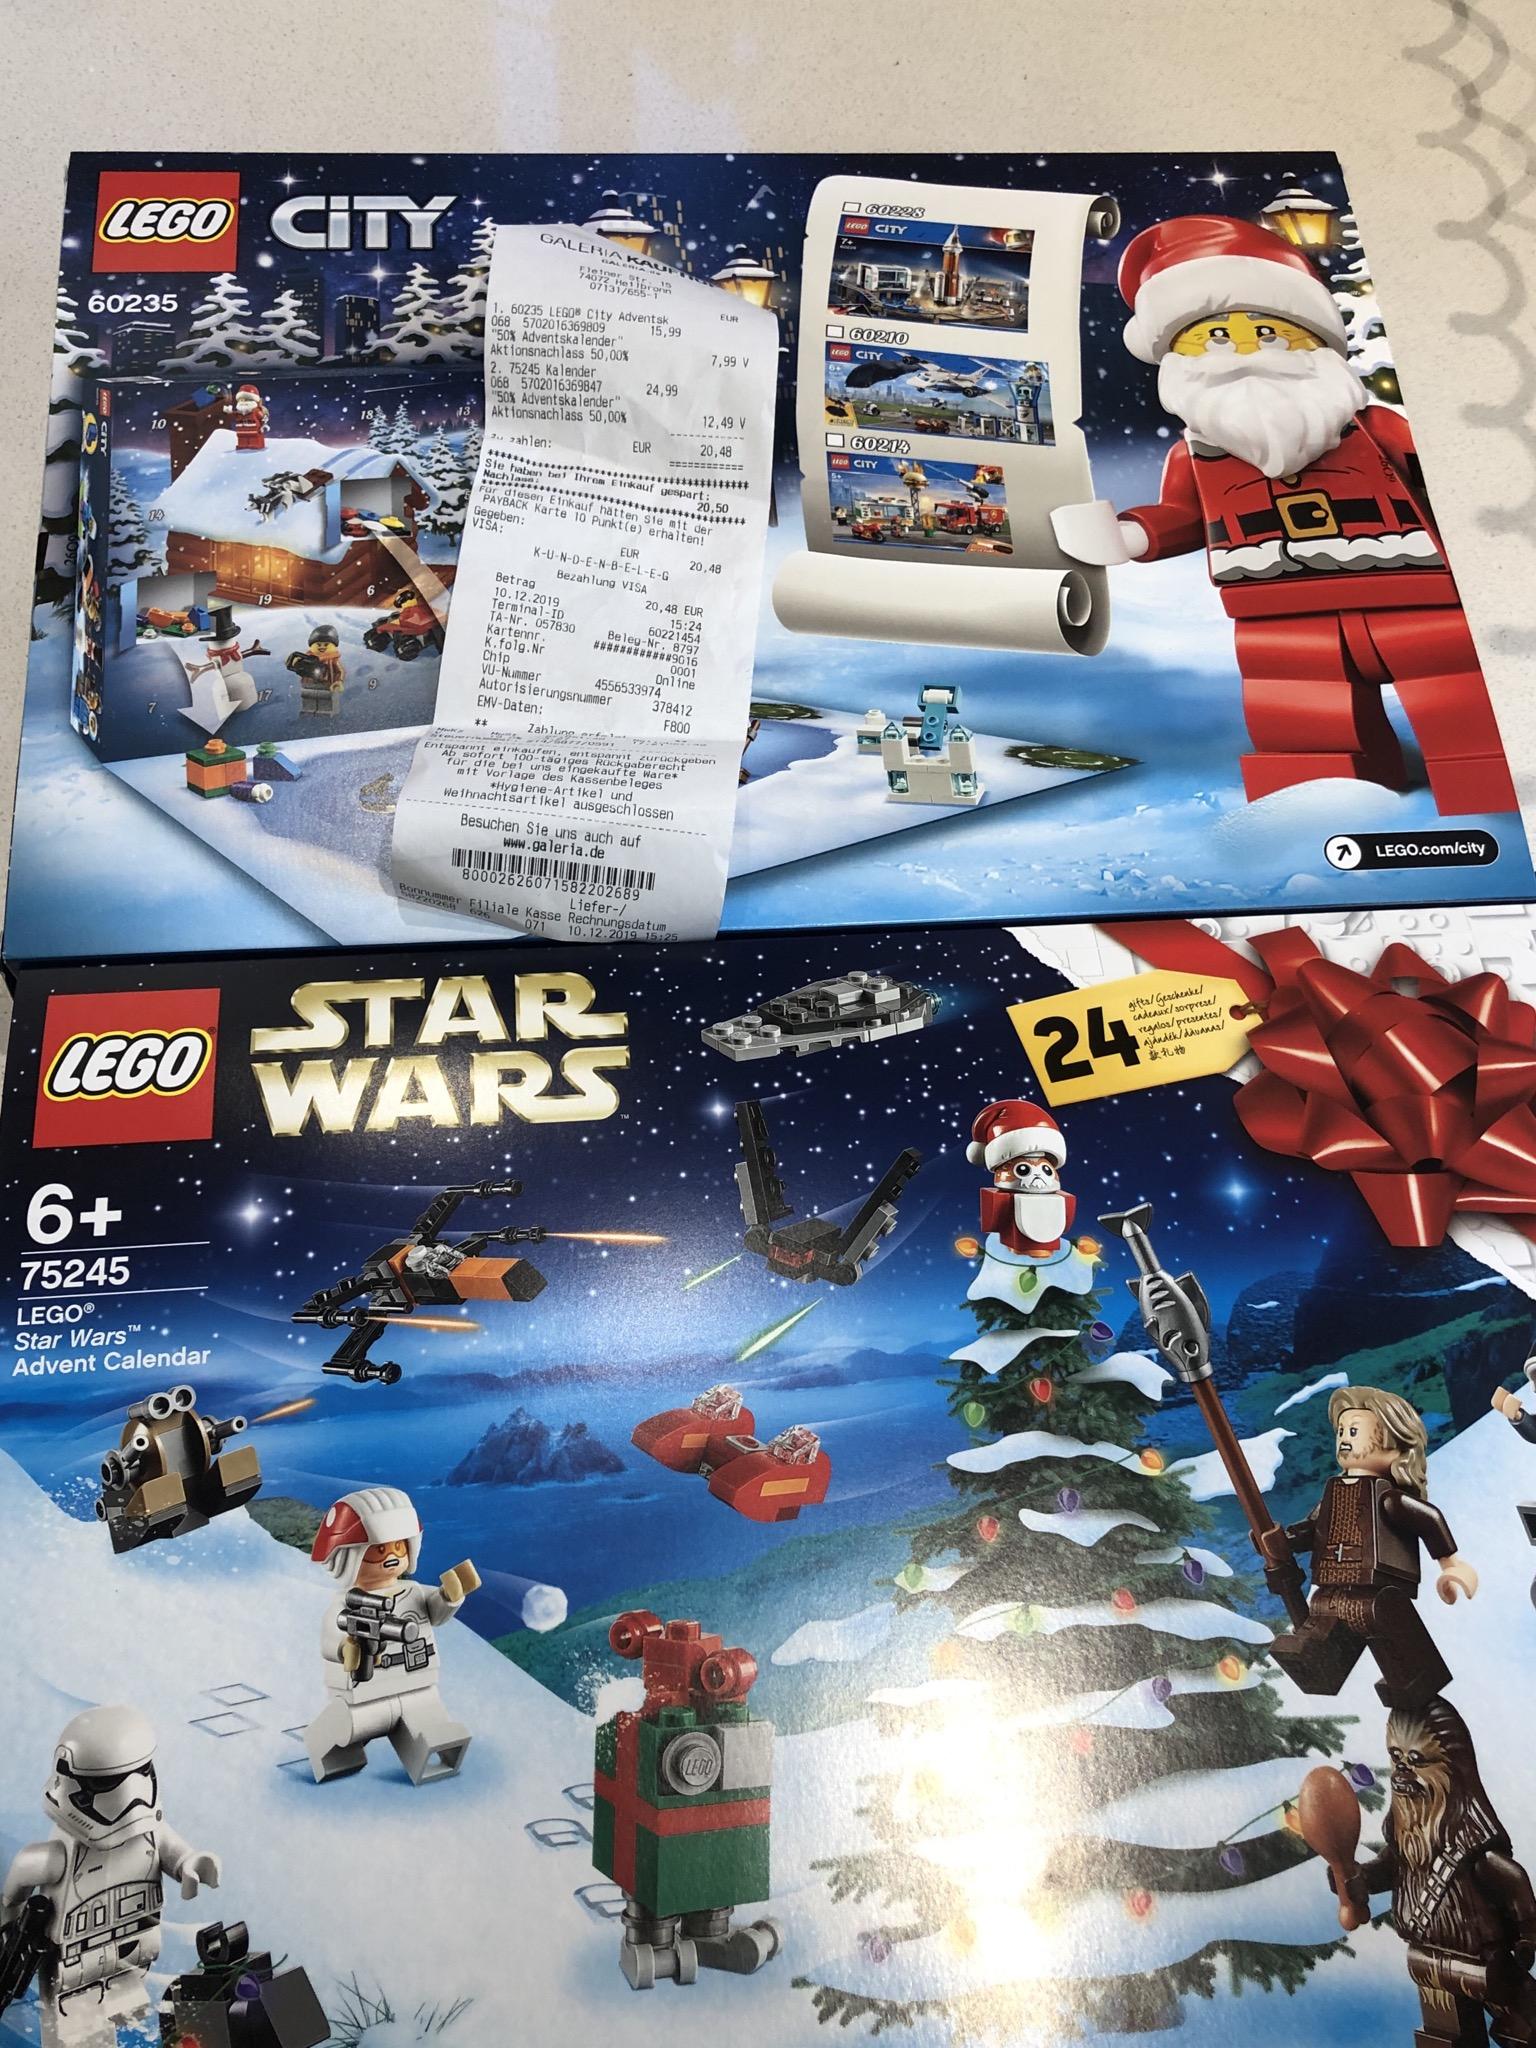 Galeria Kaufhof Lego City Adventskalender 7,99€, Star Wars 12,49€ usw